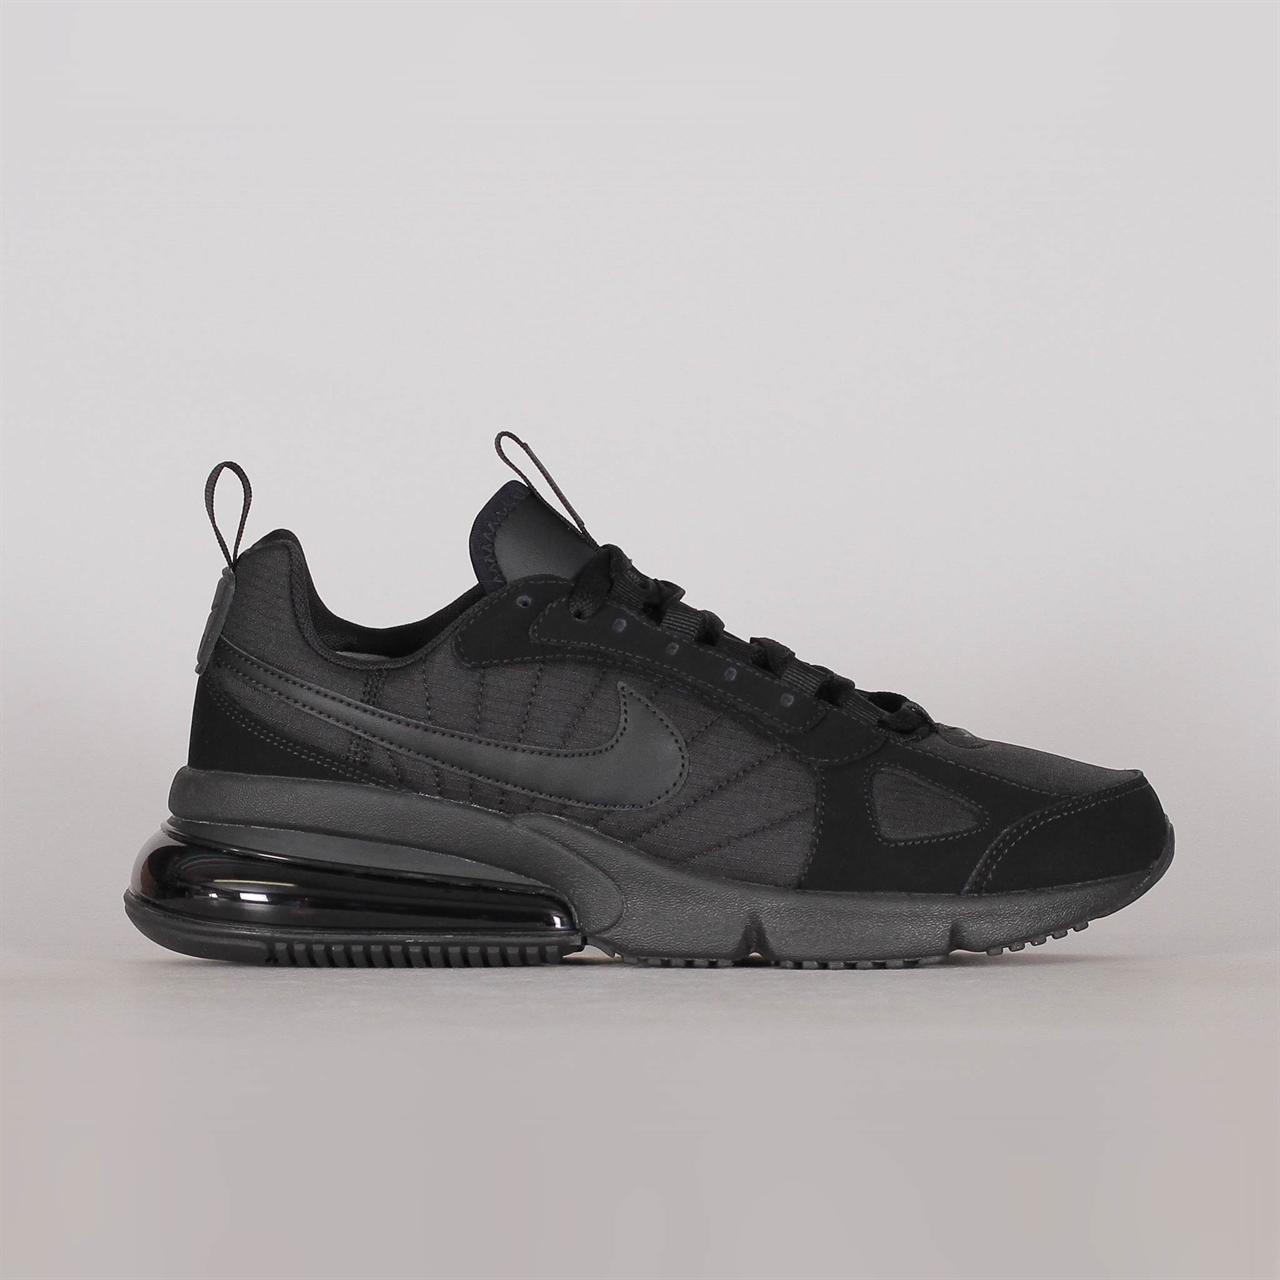 cd495c7d5b4 Shelta - Nike Air Max 270 Futura (AO1569-005)